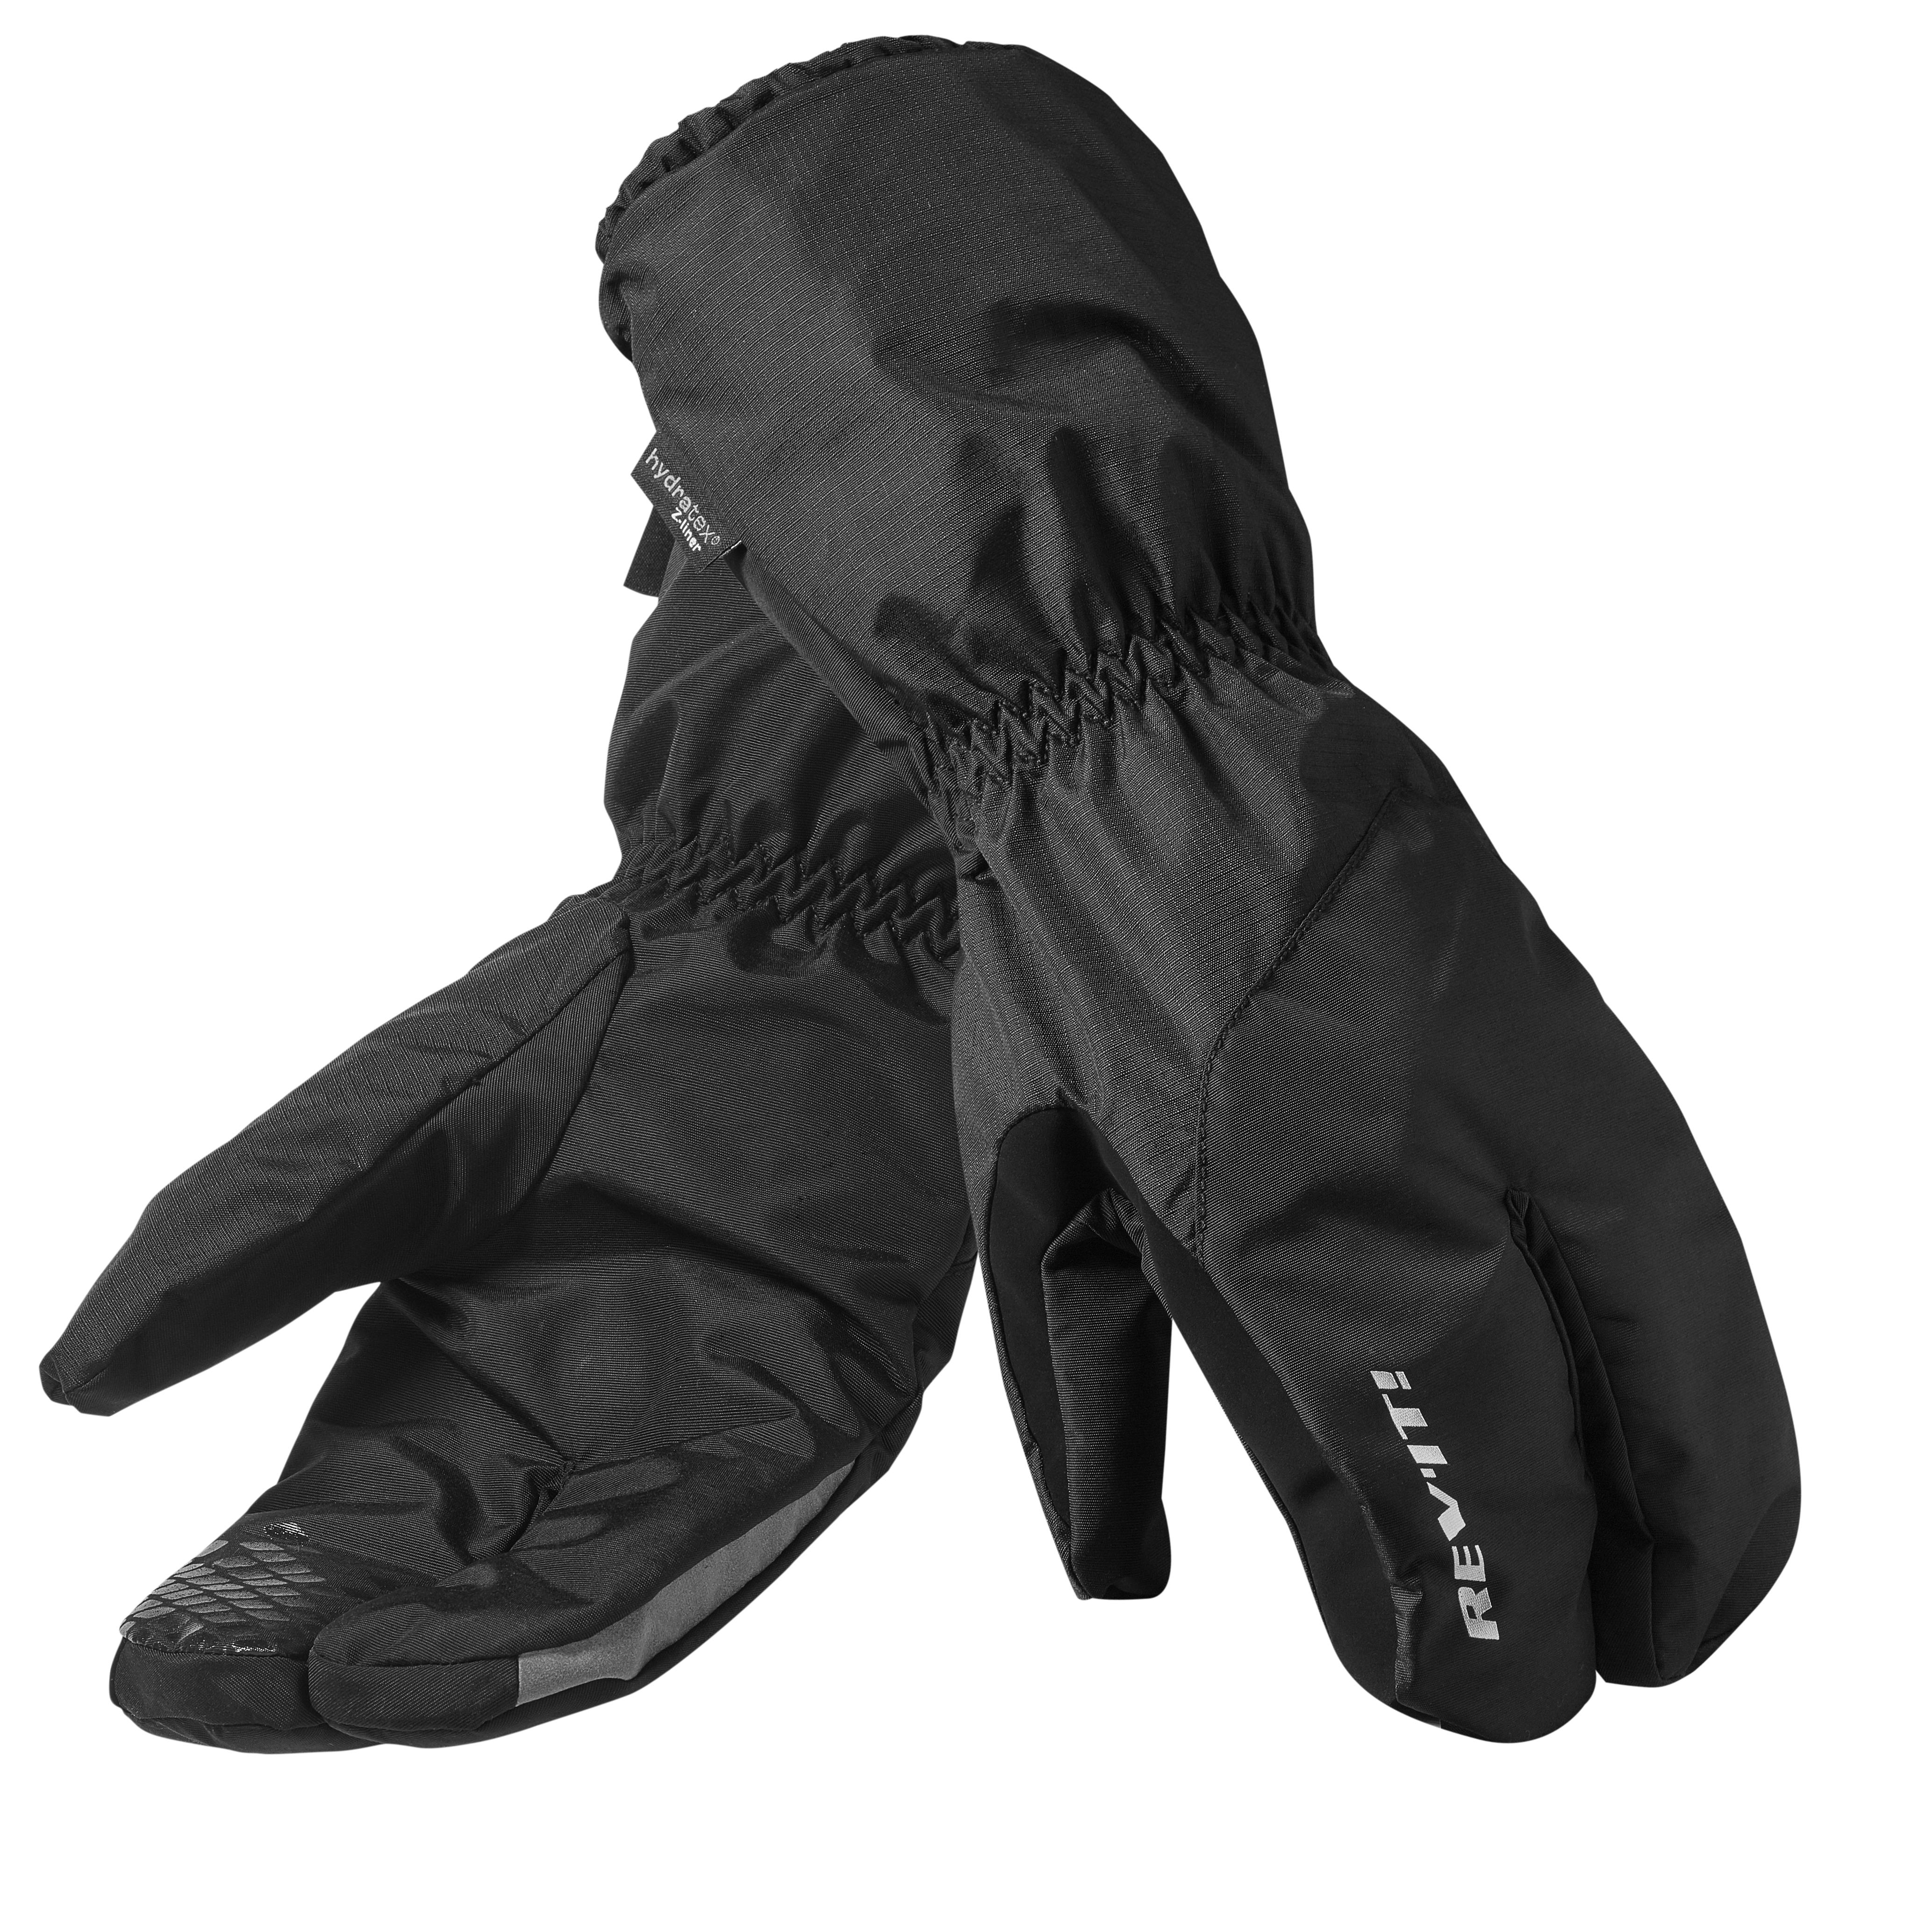 Handschoenen Spokane H2O | Afbeelding 1